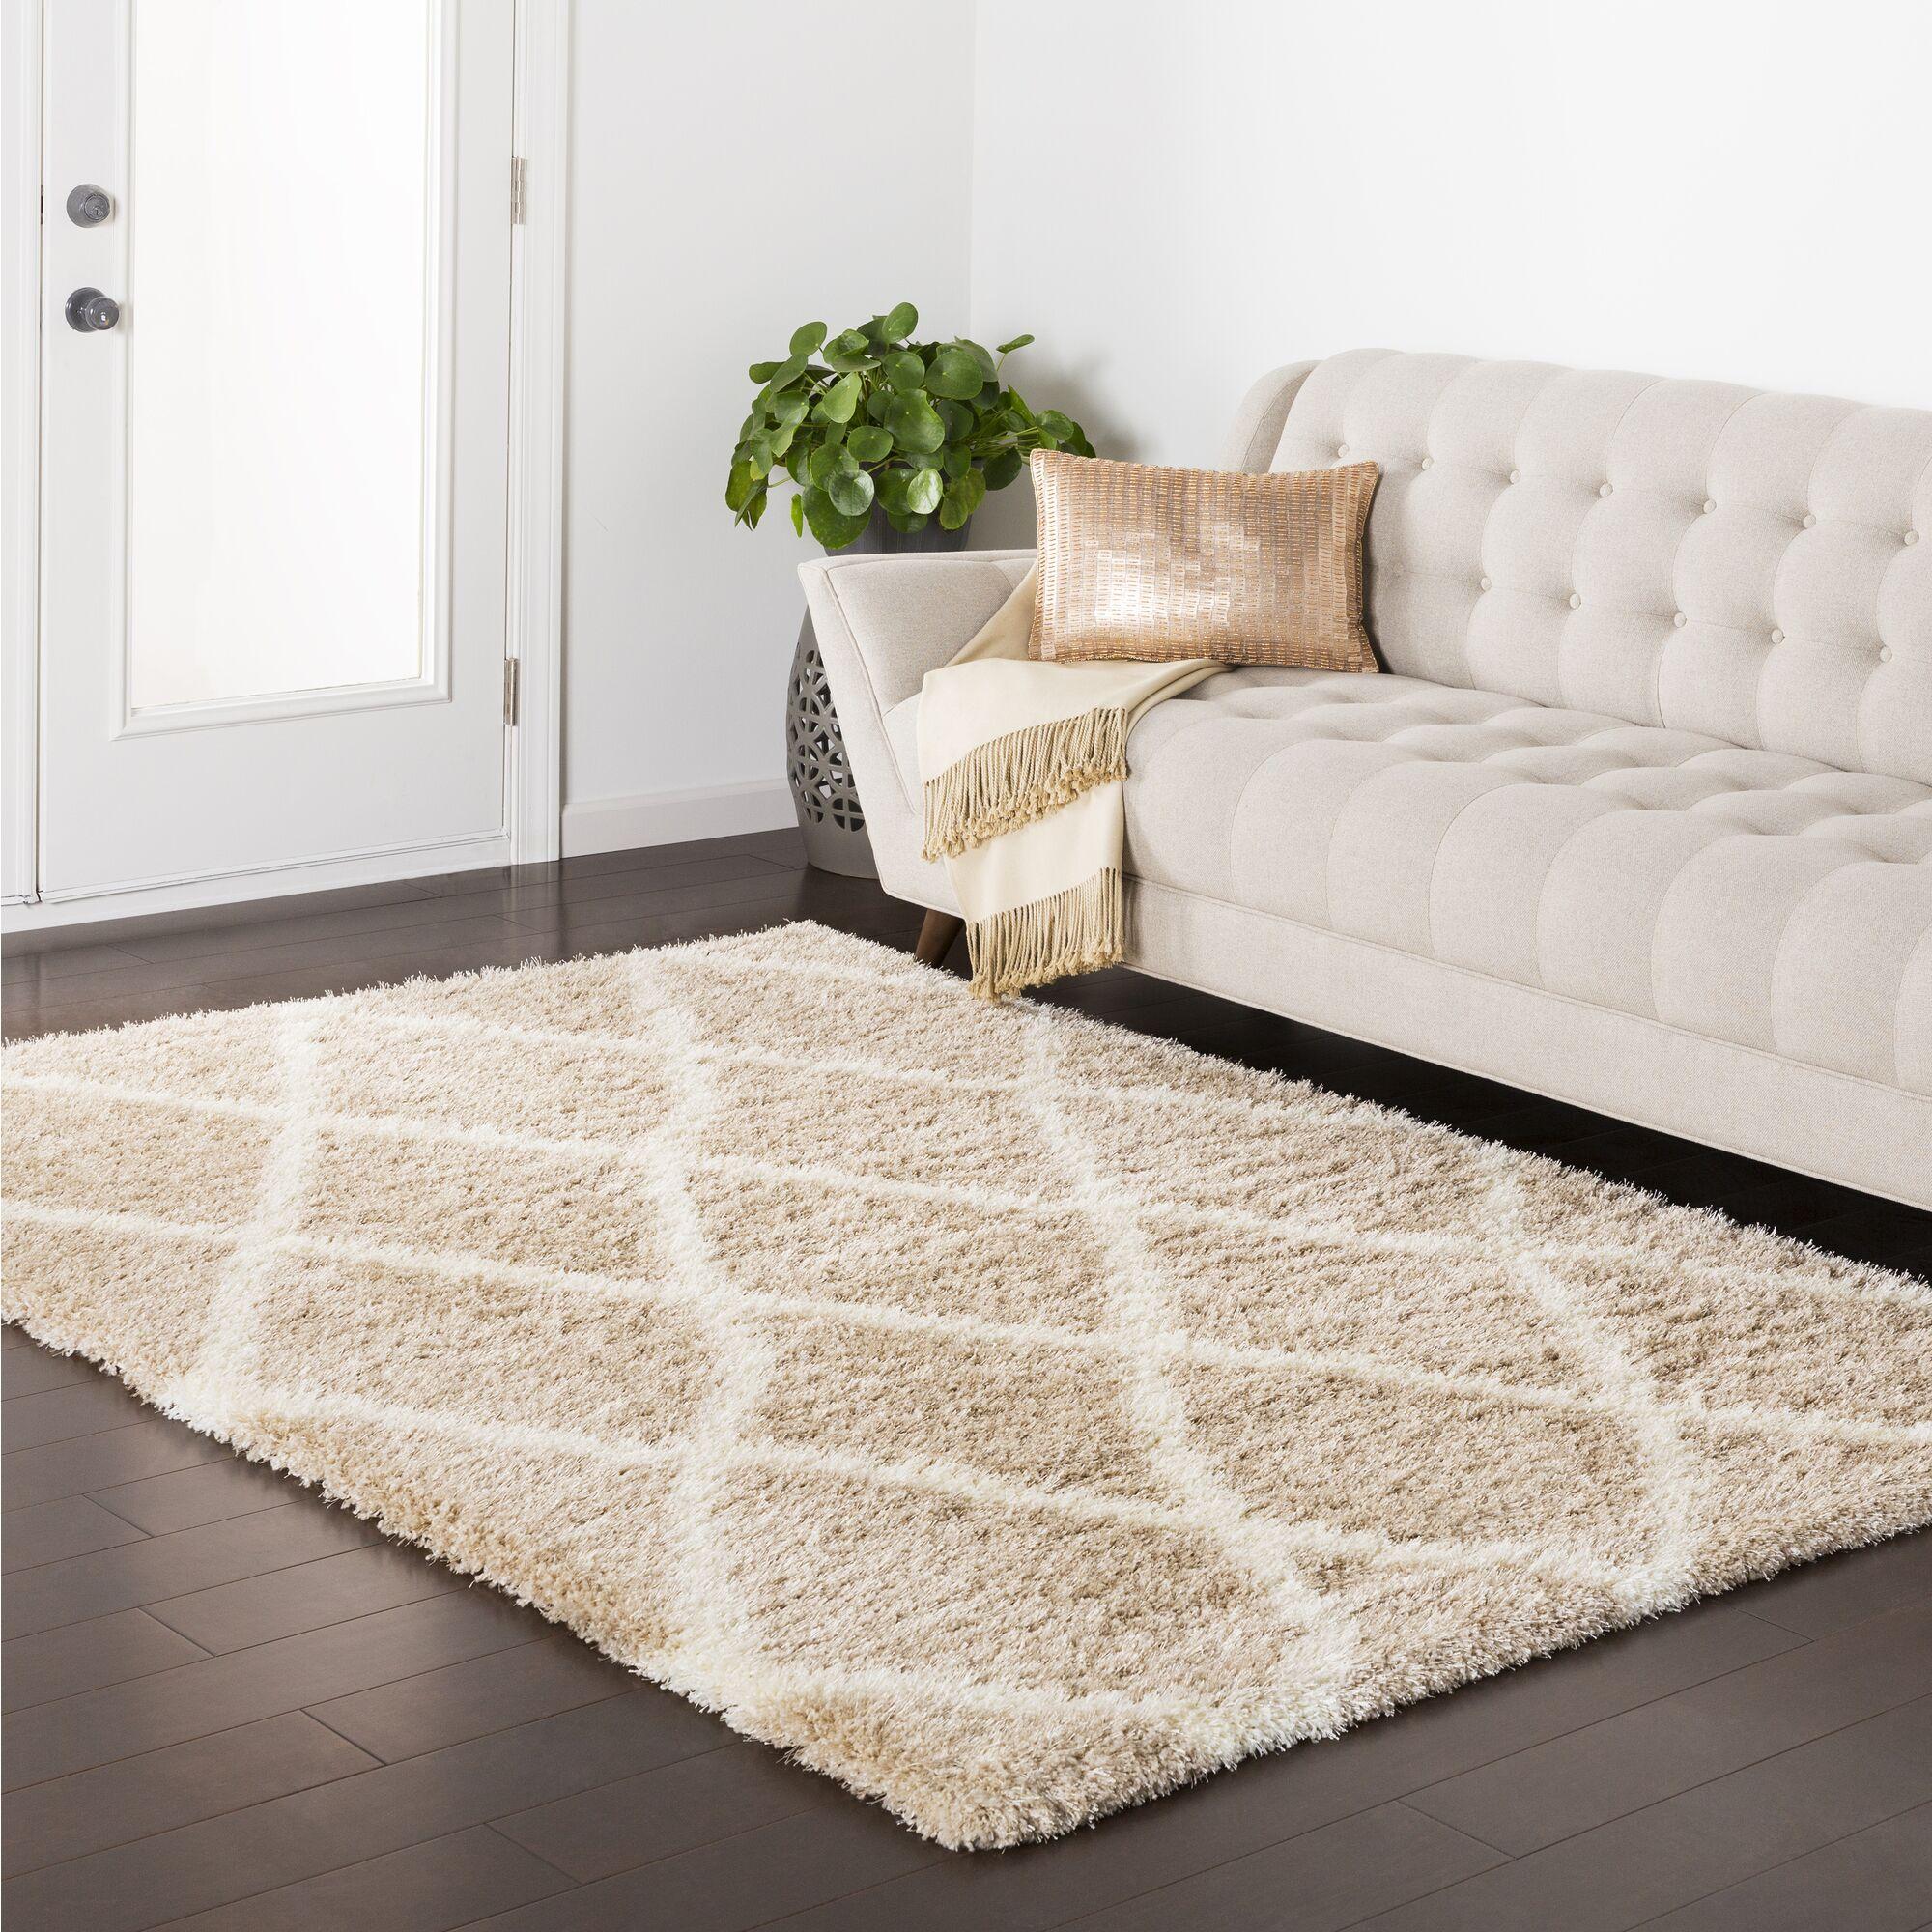 Kolton Brown Indoor Area Rug Rug Size: Rectangle 5'3